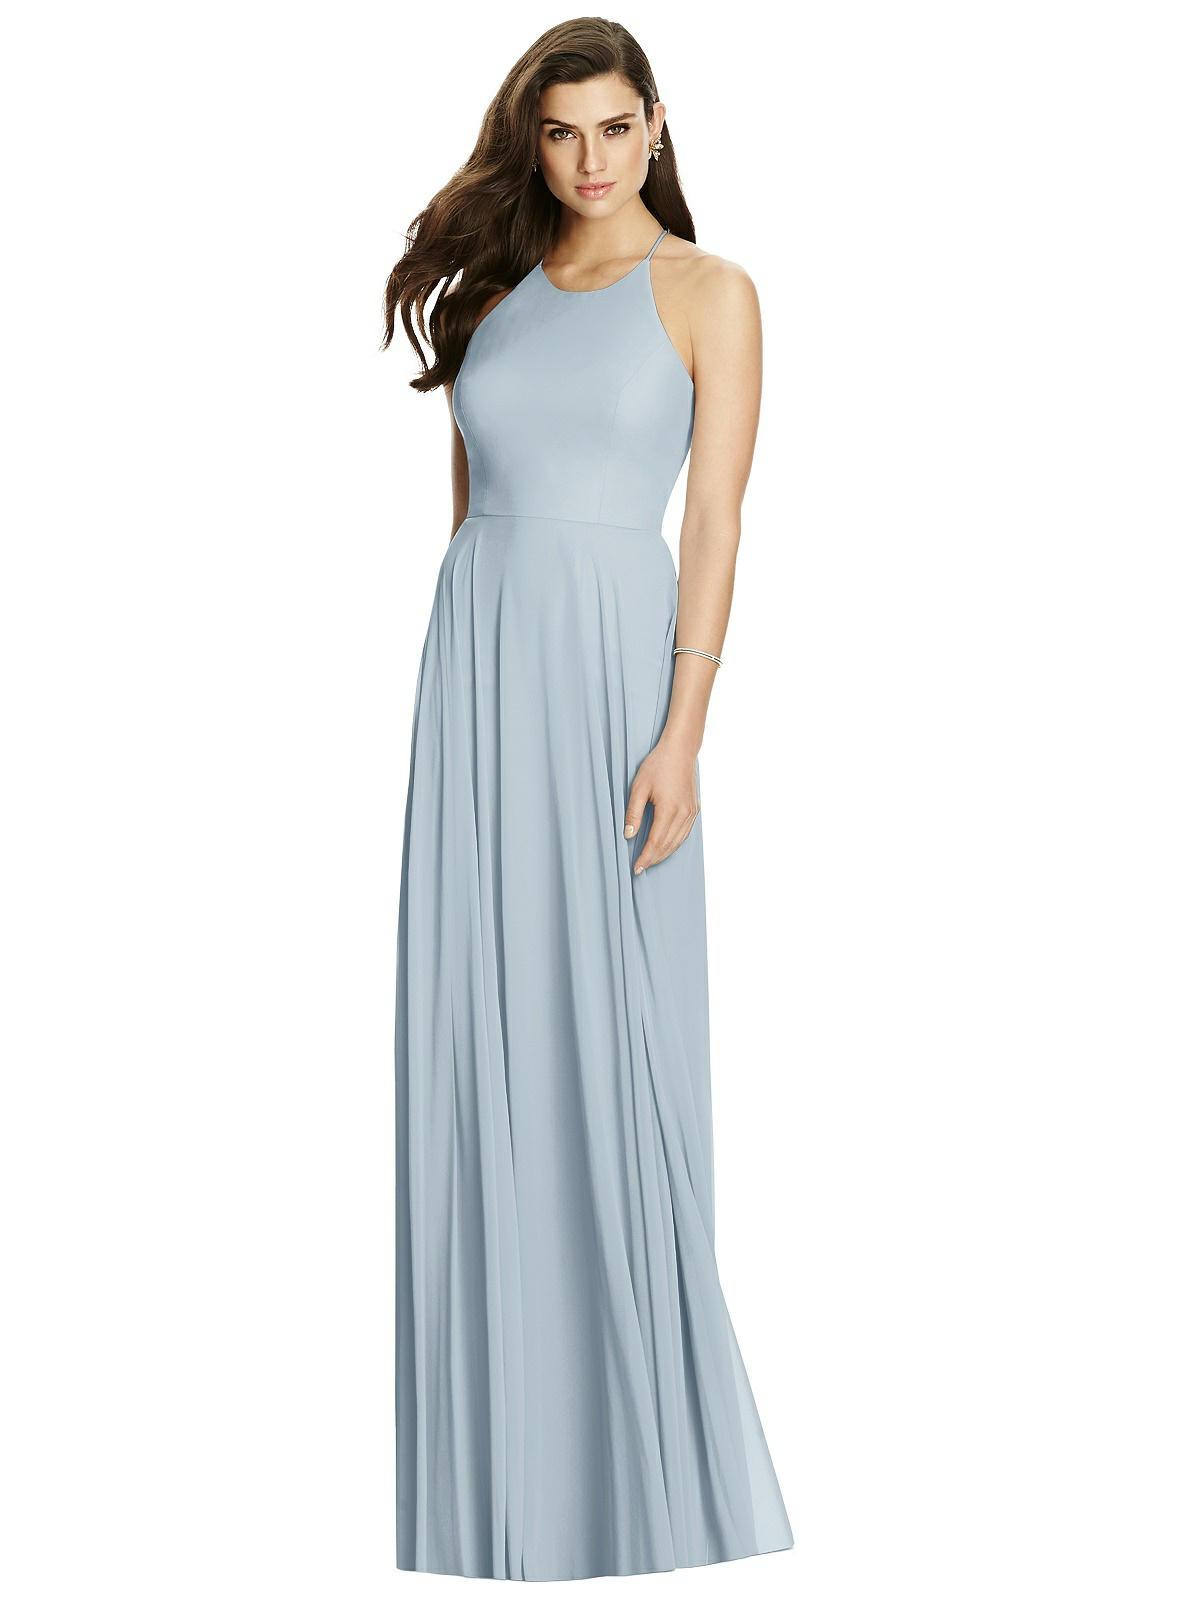 efcfb1af116 Home · Bridesmaid Dresses · Dessy Bridesmaid Dress 2988. ○  ○